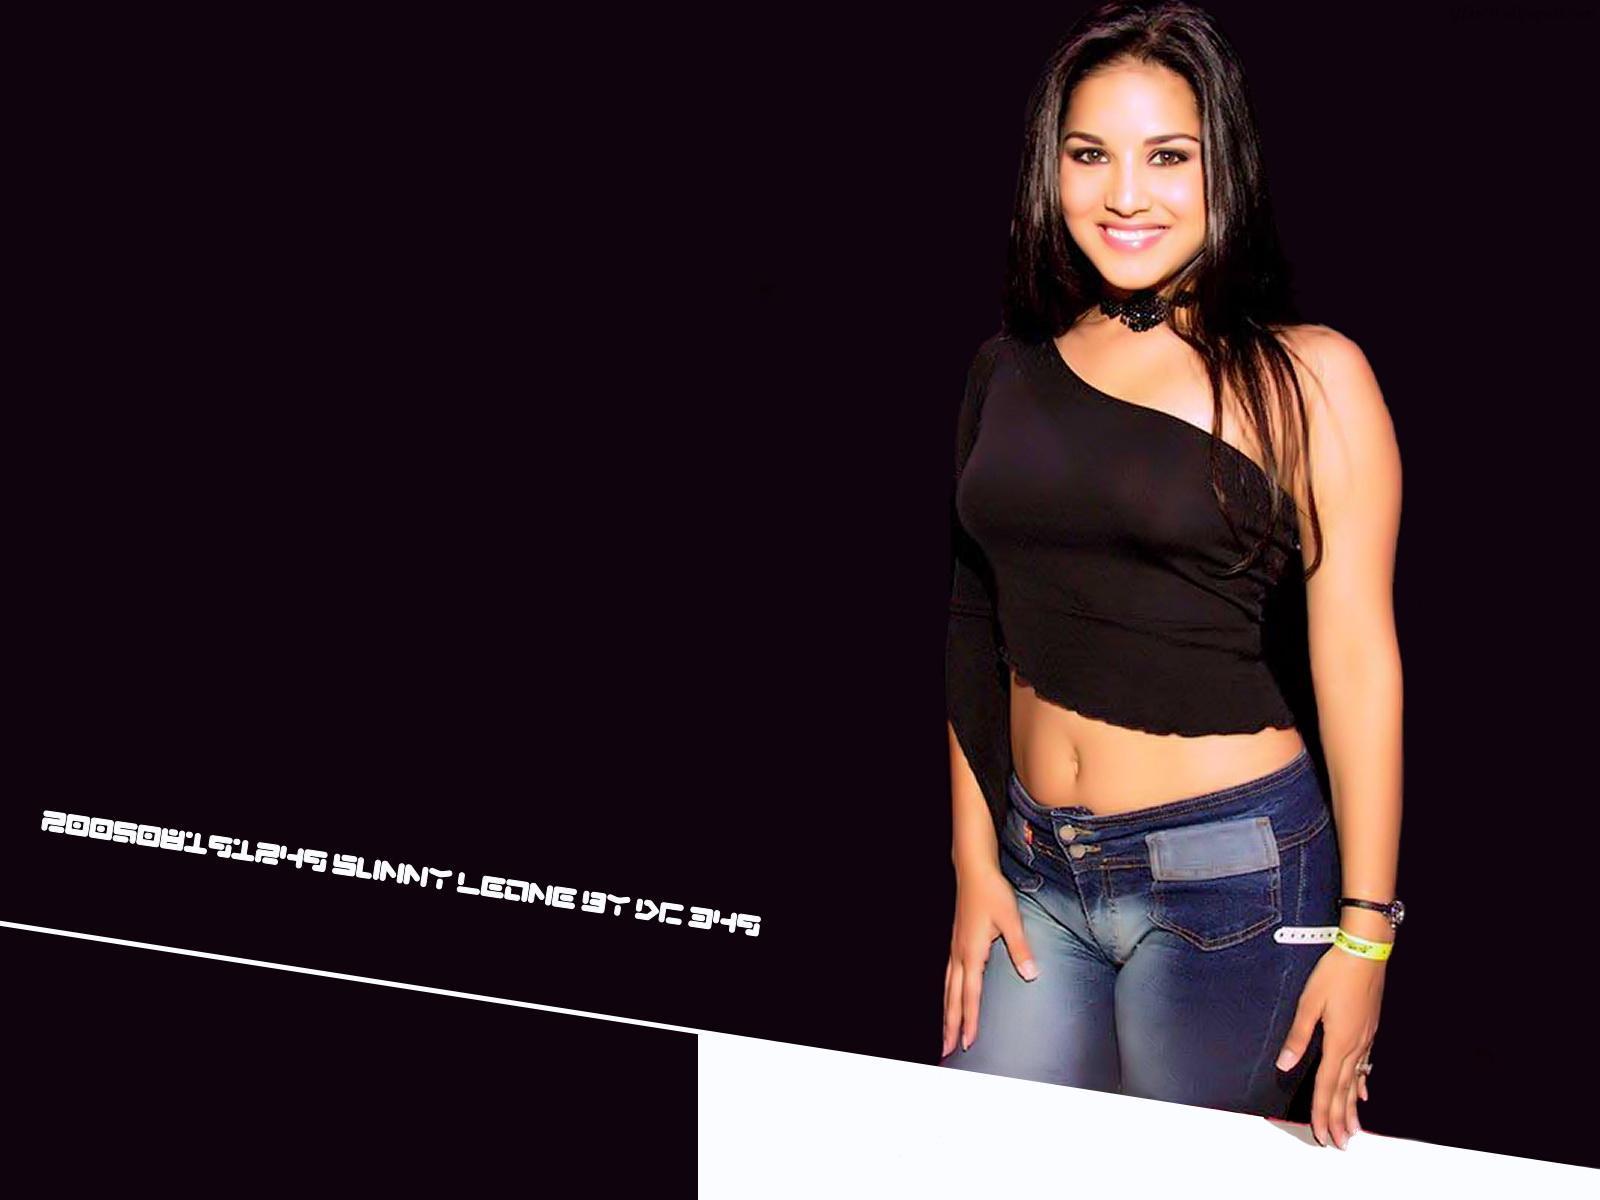 Sunny Leone Glamorous Model Wallpaper-01-1600x1200